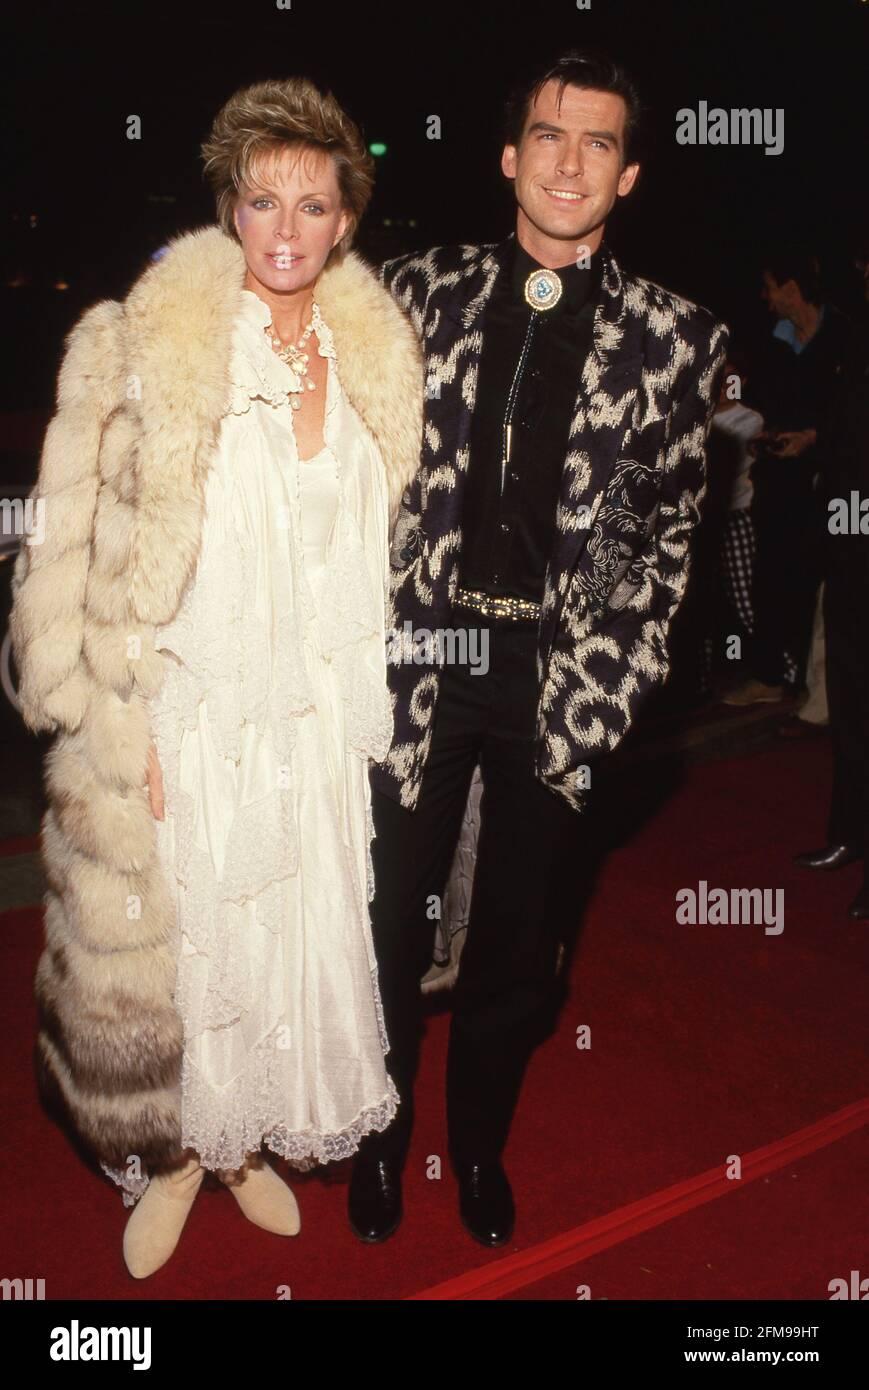 Pierce Brosnan y Cassandra Harris Circa 80's Crédito: Ralph Dominguez/MediaPunch Foto de stock